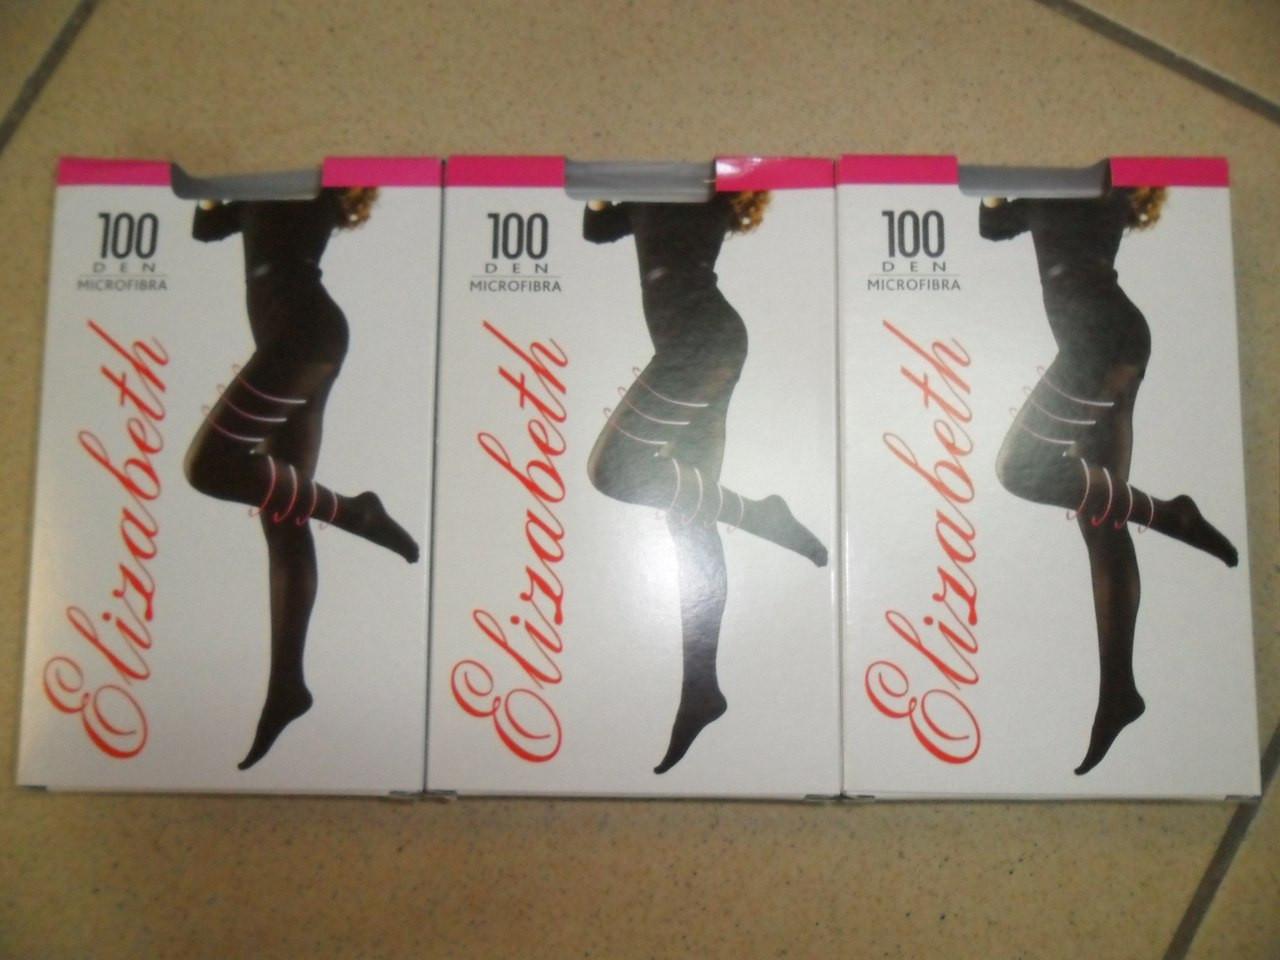 Колготки Элизабет 100 Ден, размер 3, цвет шоколад эл-100